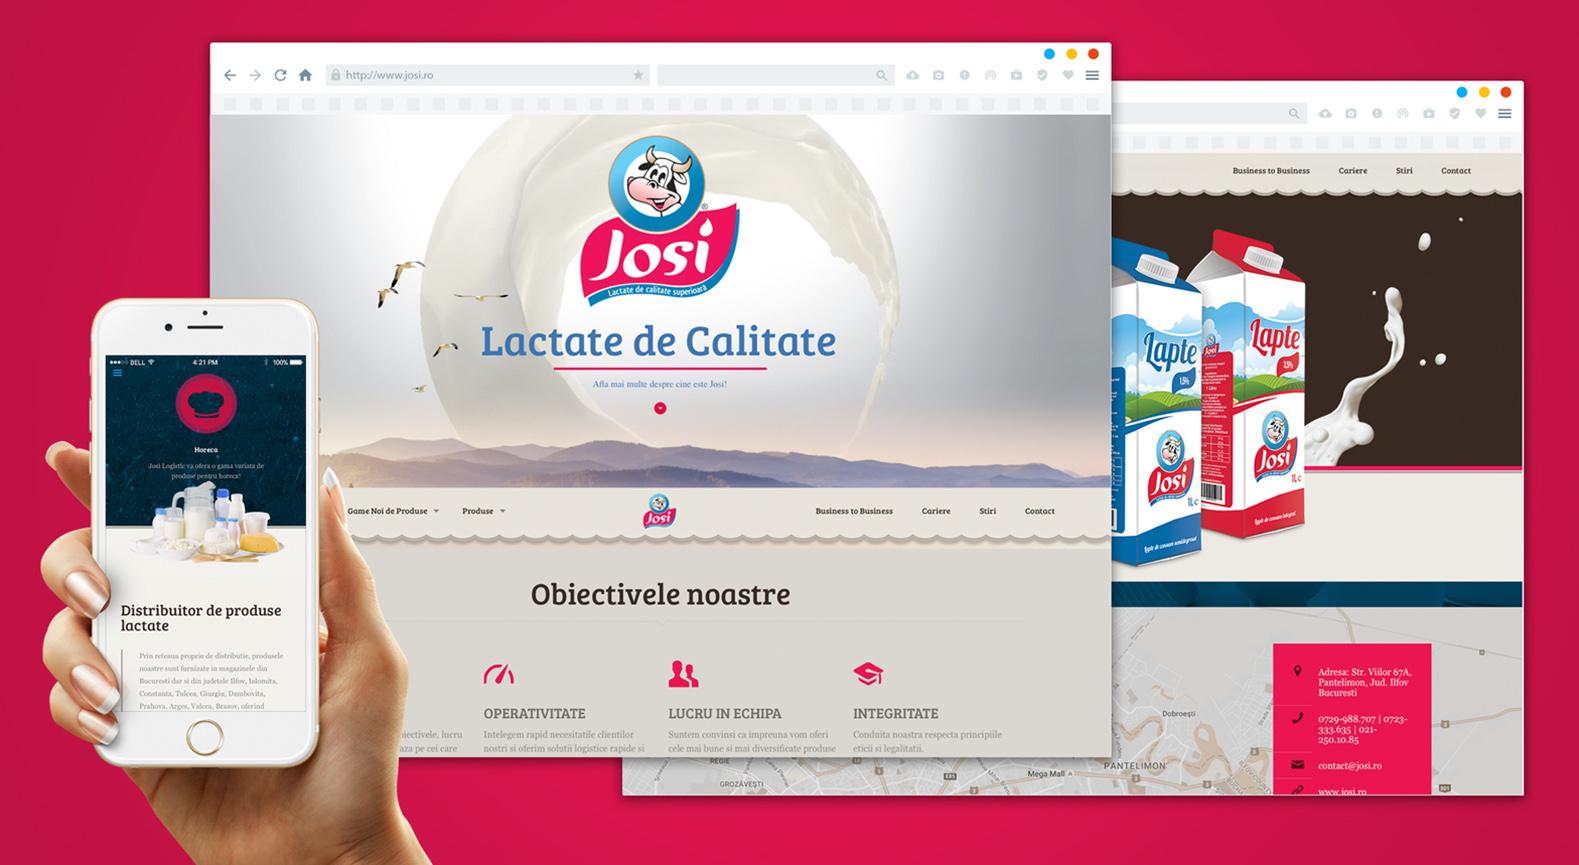 tudor_deleanu_creative_design_art_advertising_web_website__0010_Lactate Josi